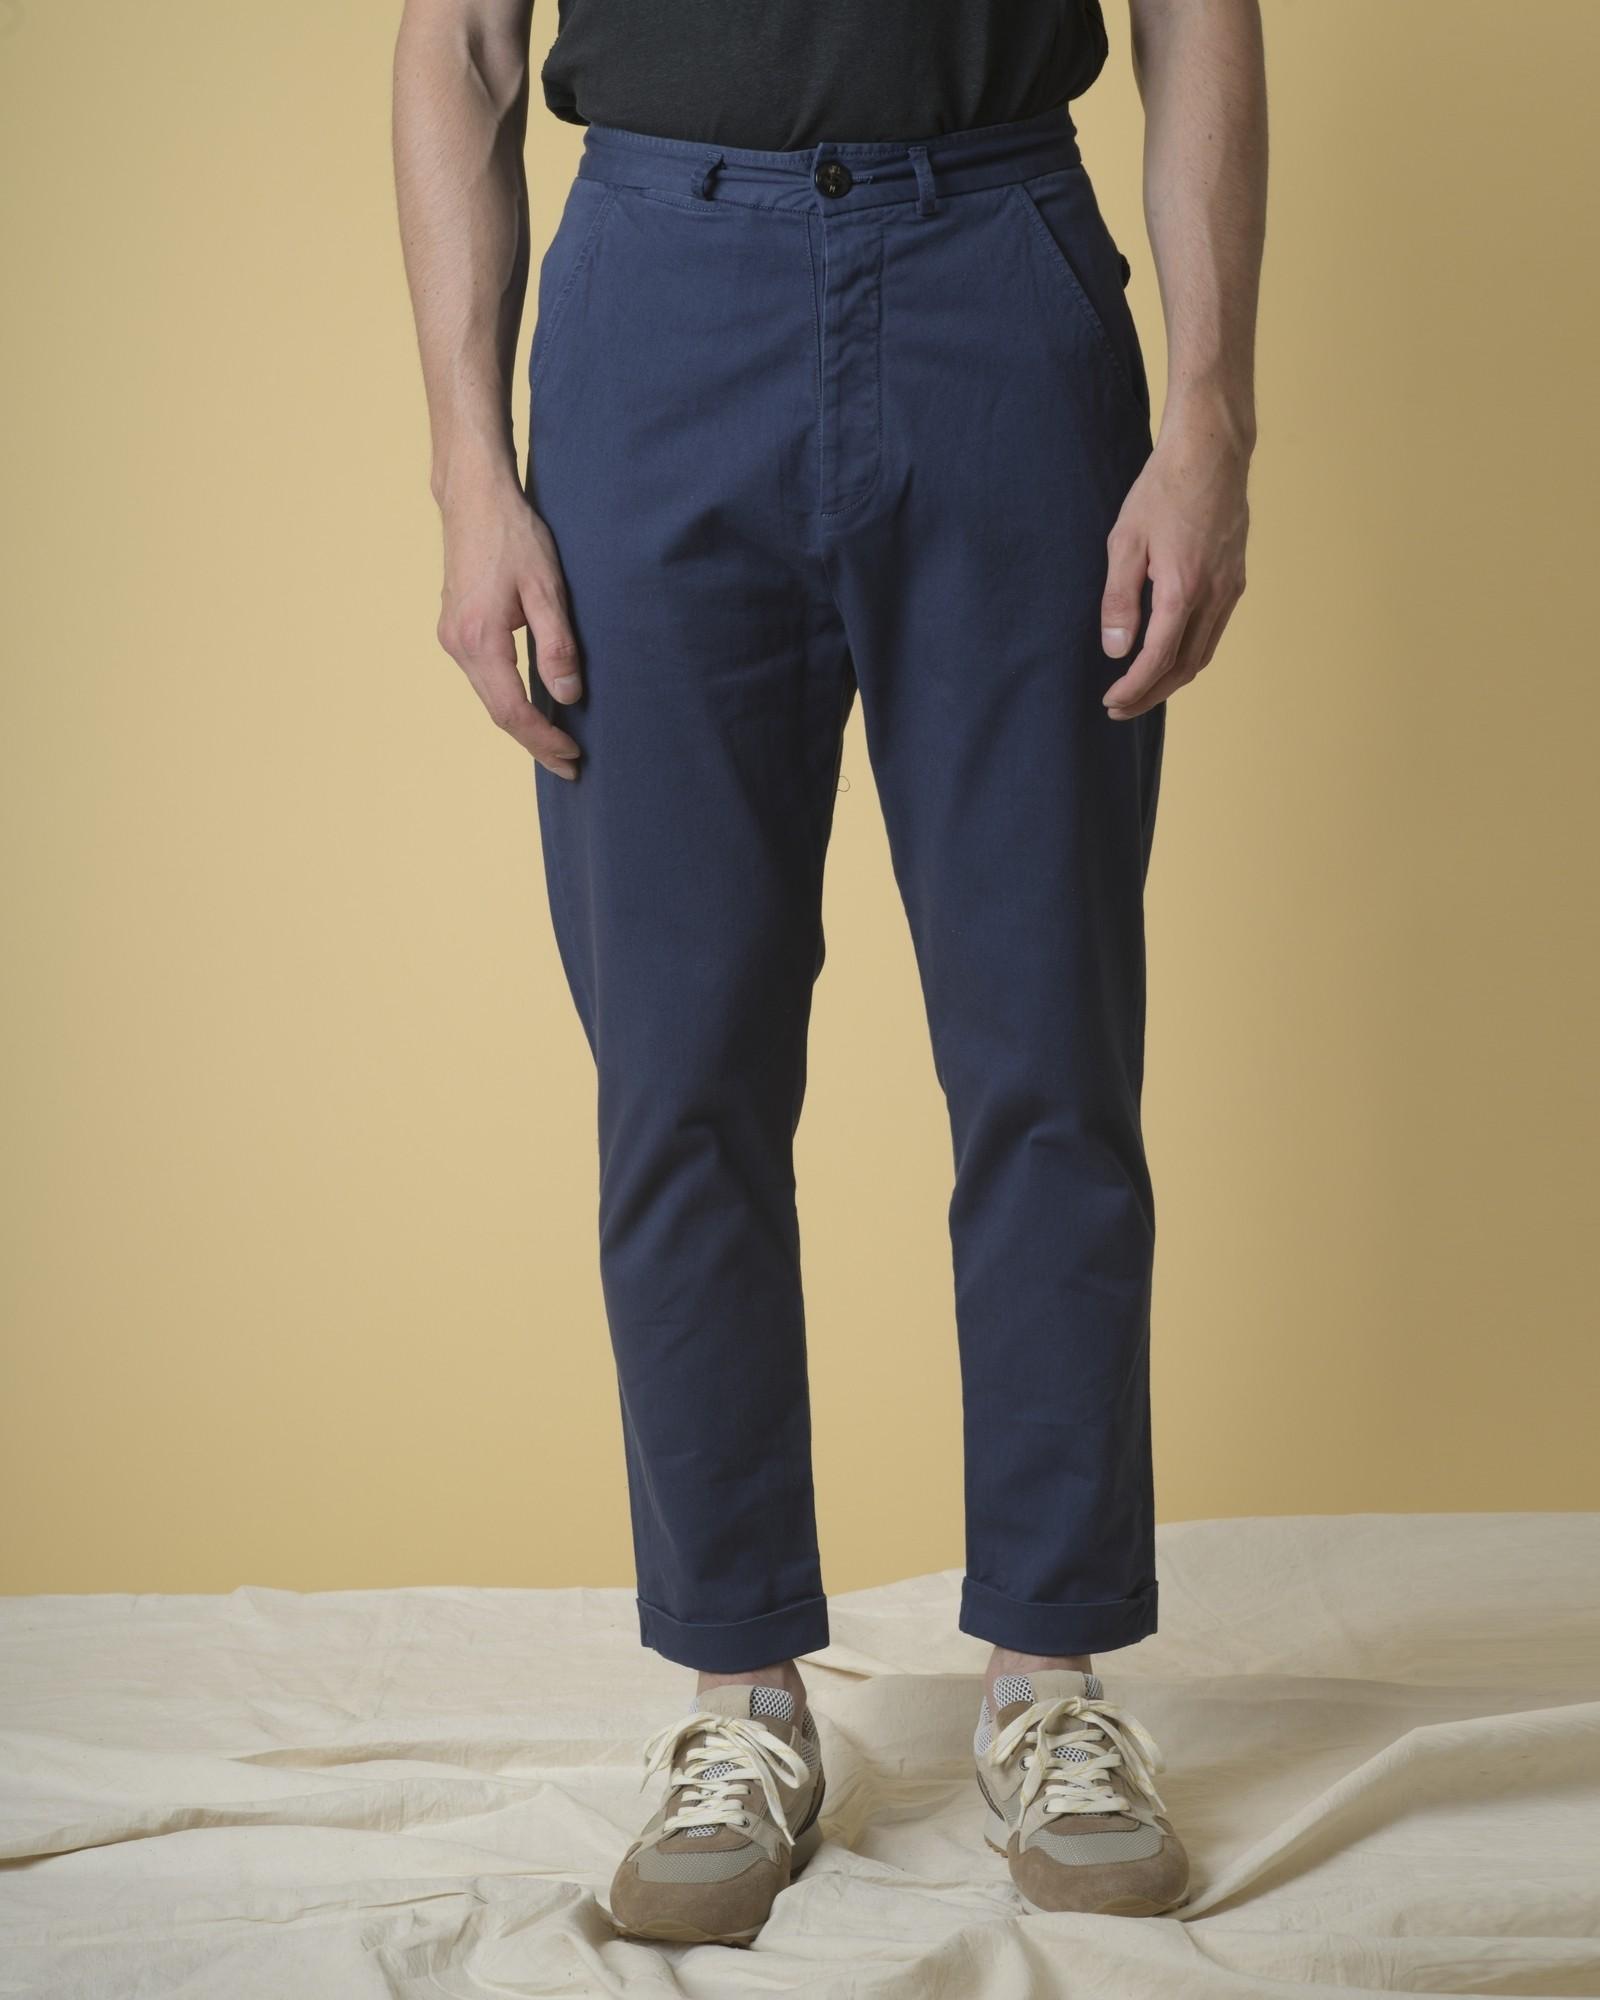 Pantalon fuselé en coton Soho so nice